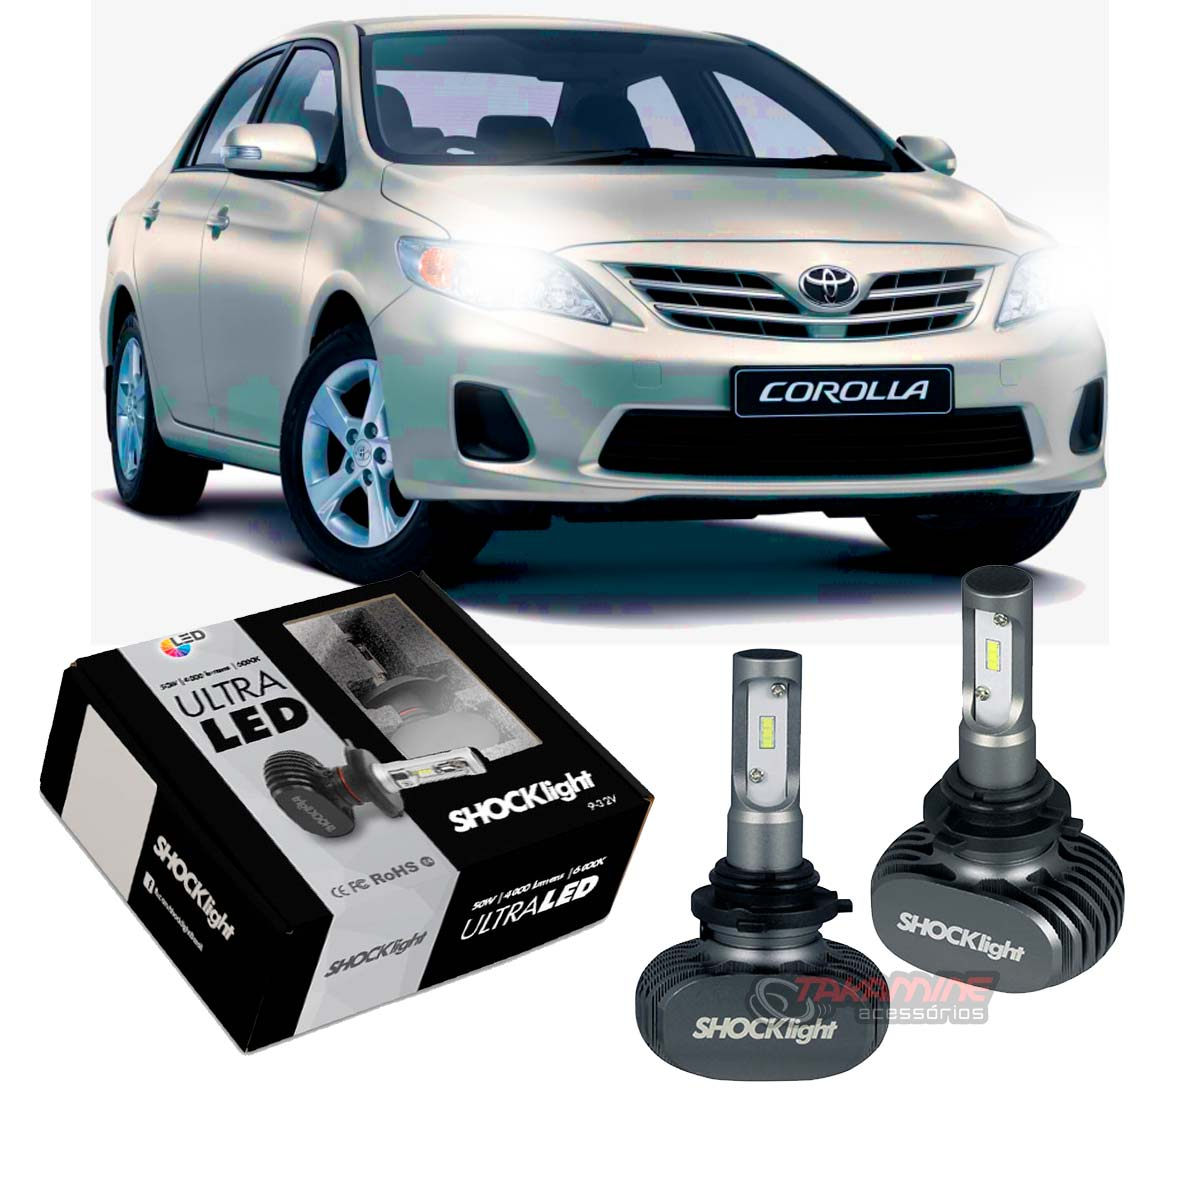 Kit Ultra LED Corolla 2012 2013 2014 tipo xenon farol baixo HB4 50W